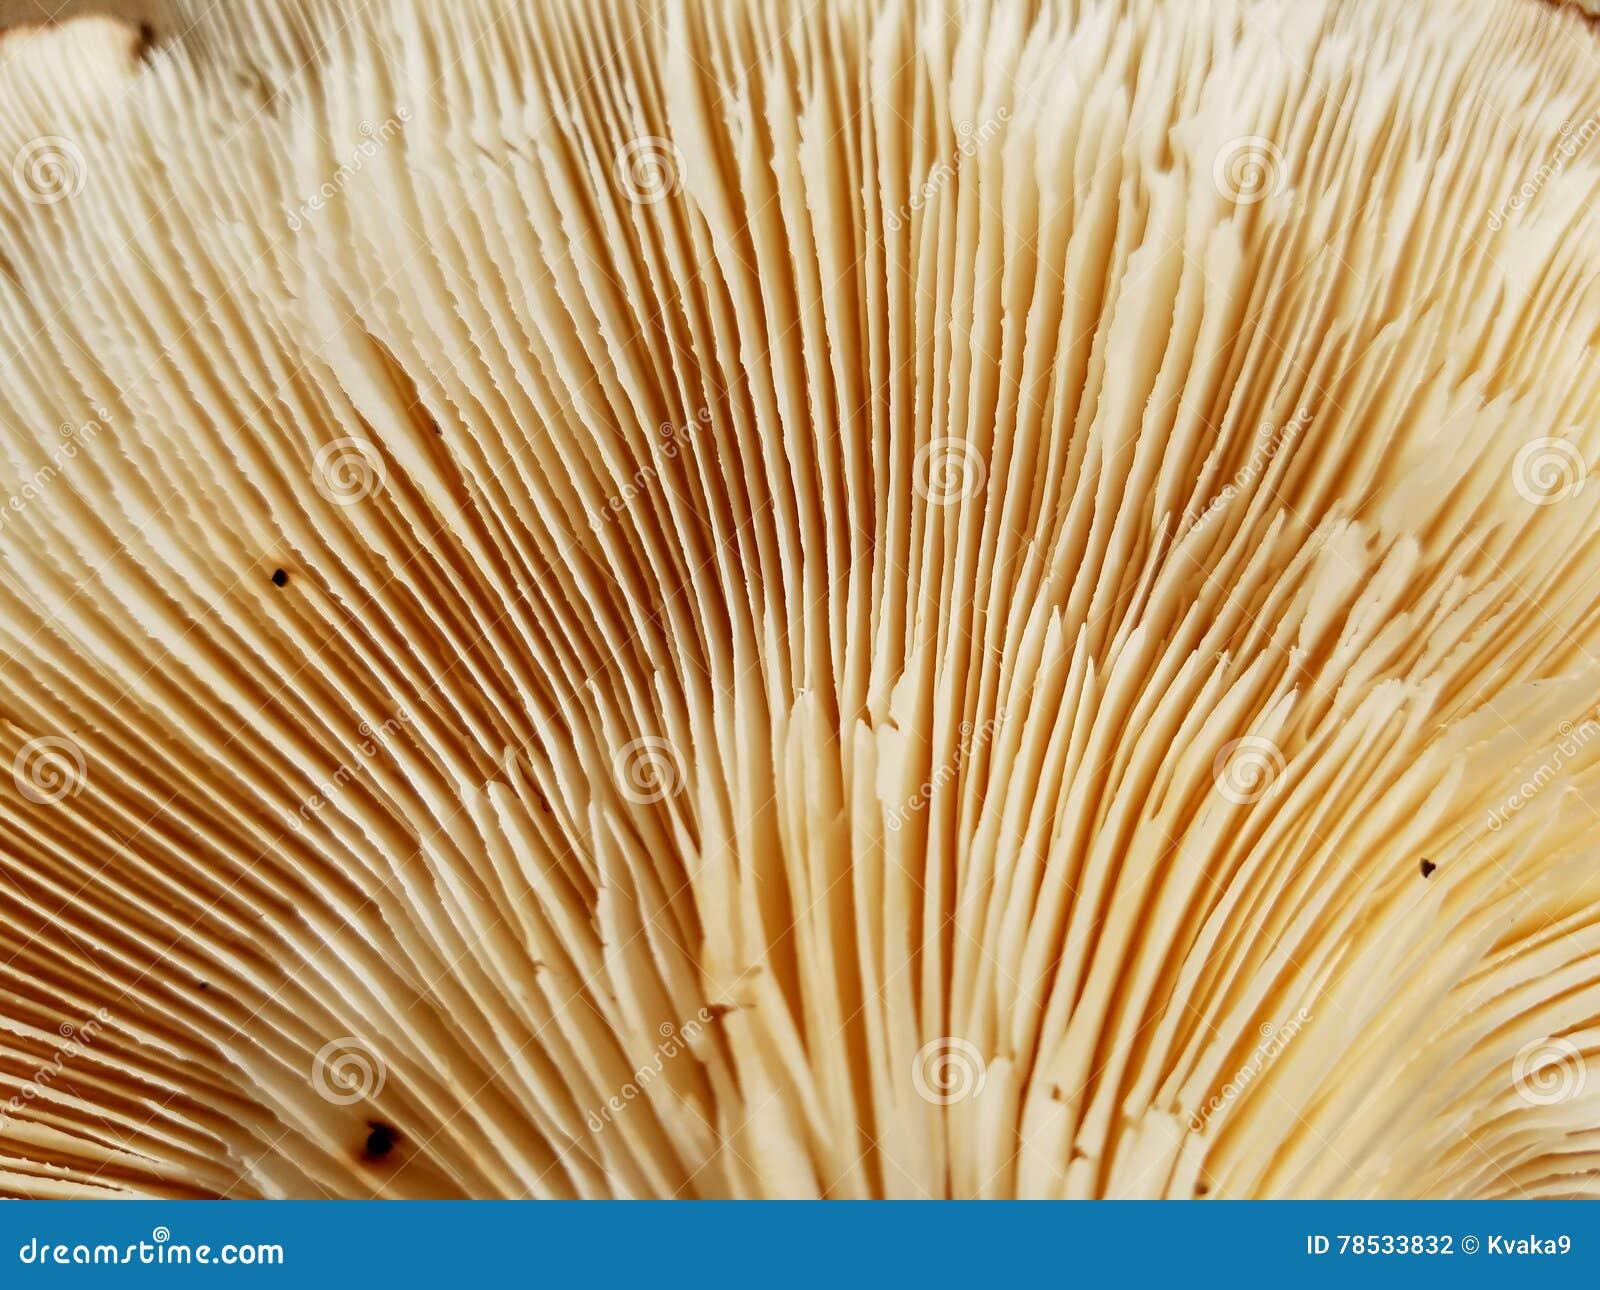 Cogumelo de shiitake orgânico - ascendente próximo